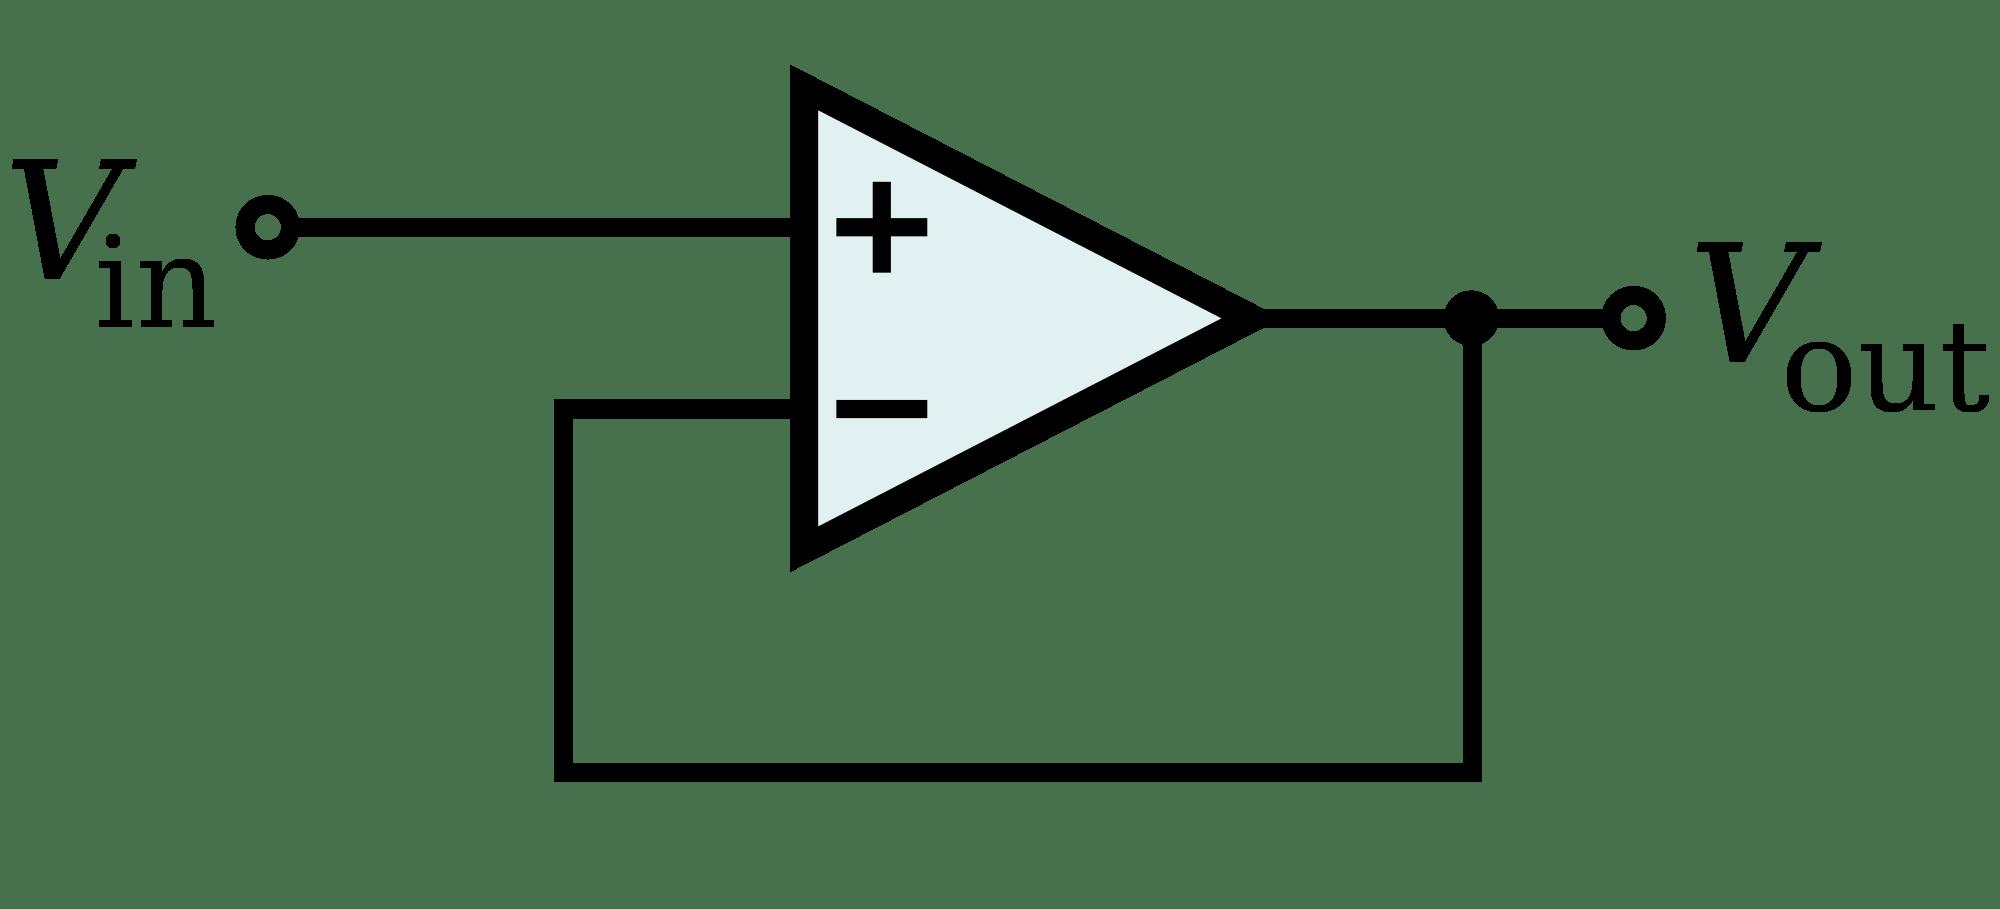 Sensingog Voltage On Arduino Without Loading The